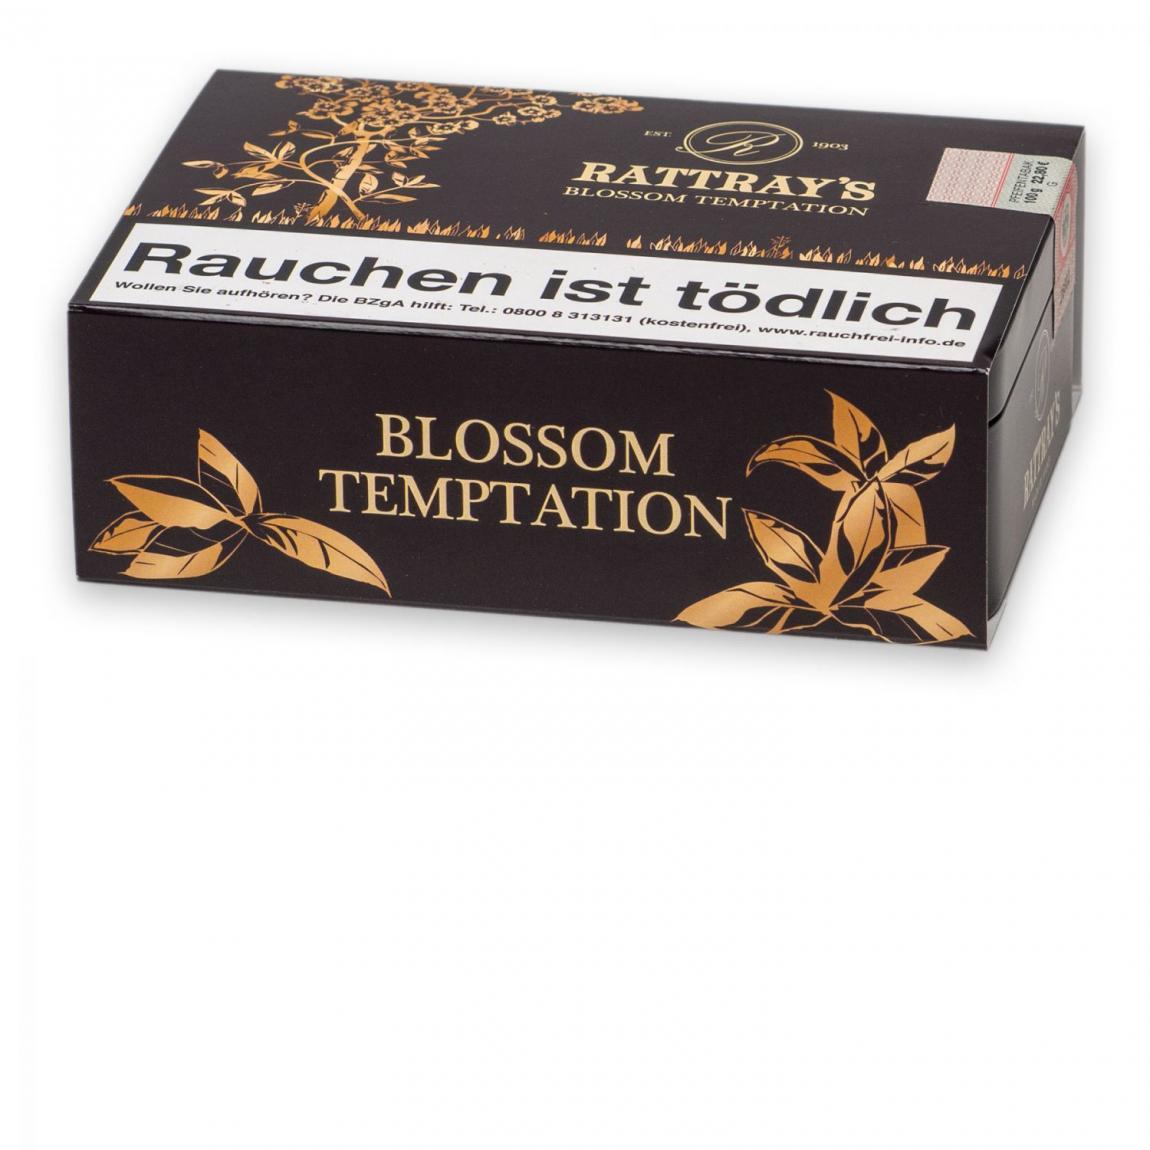 Rattray's Blossom Temptation 100g Dose